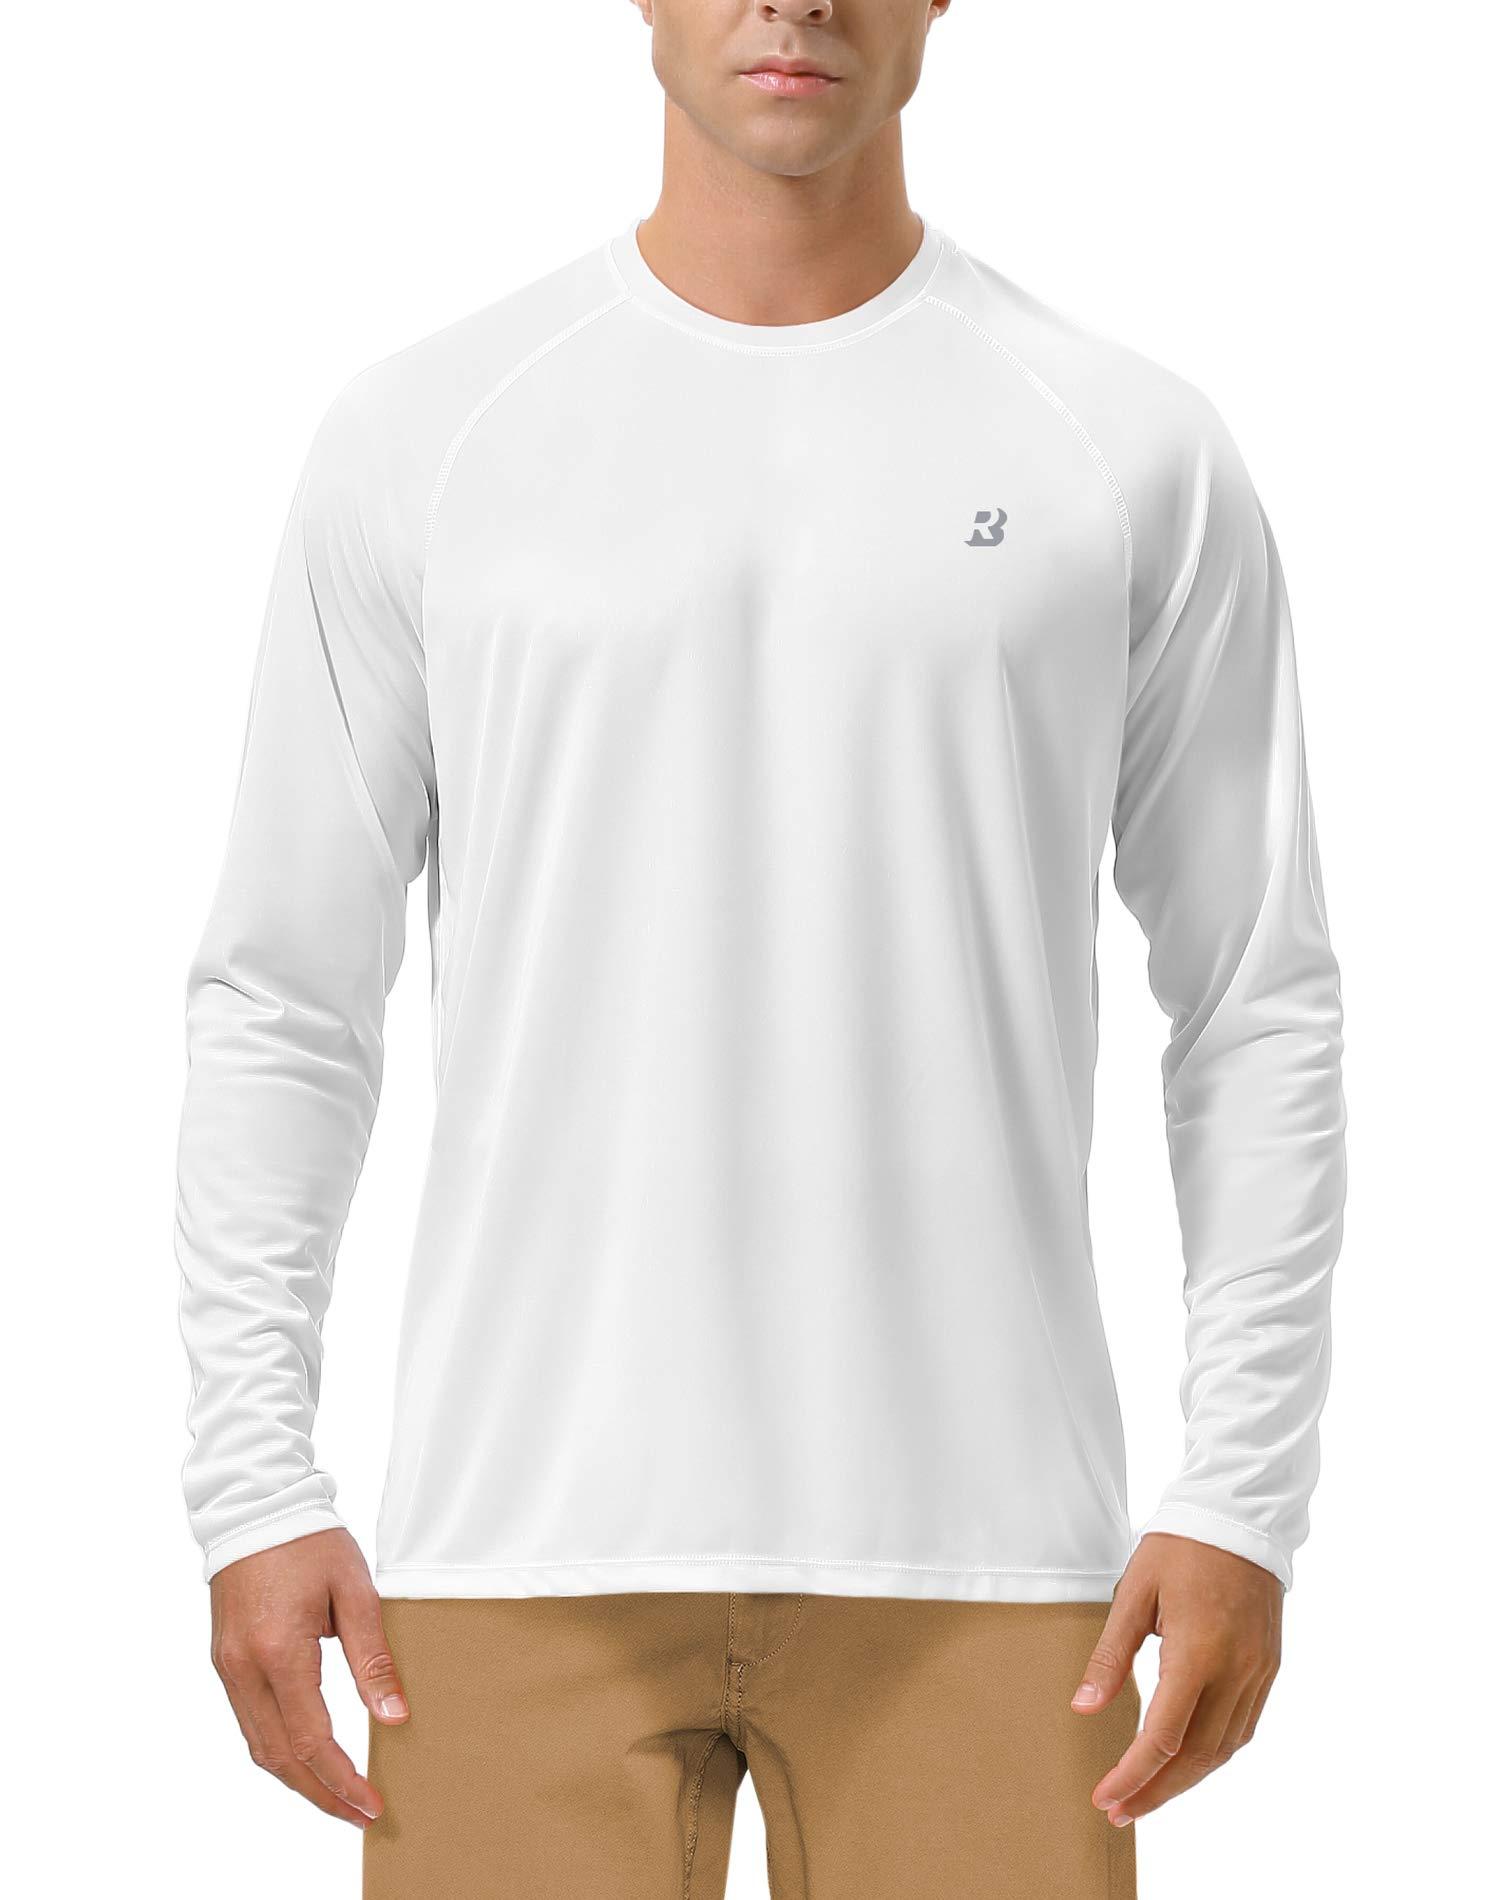 Roadbox Men's Sun Protection UPF 50+ UV Outdoor Long Sleeve Dri-fit T-Shirt Rashguard for Running, Fishing, Hiking(Small, White) by Roadbox